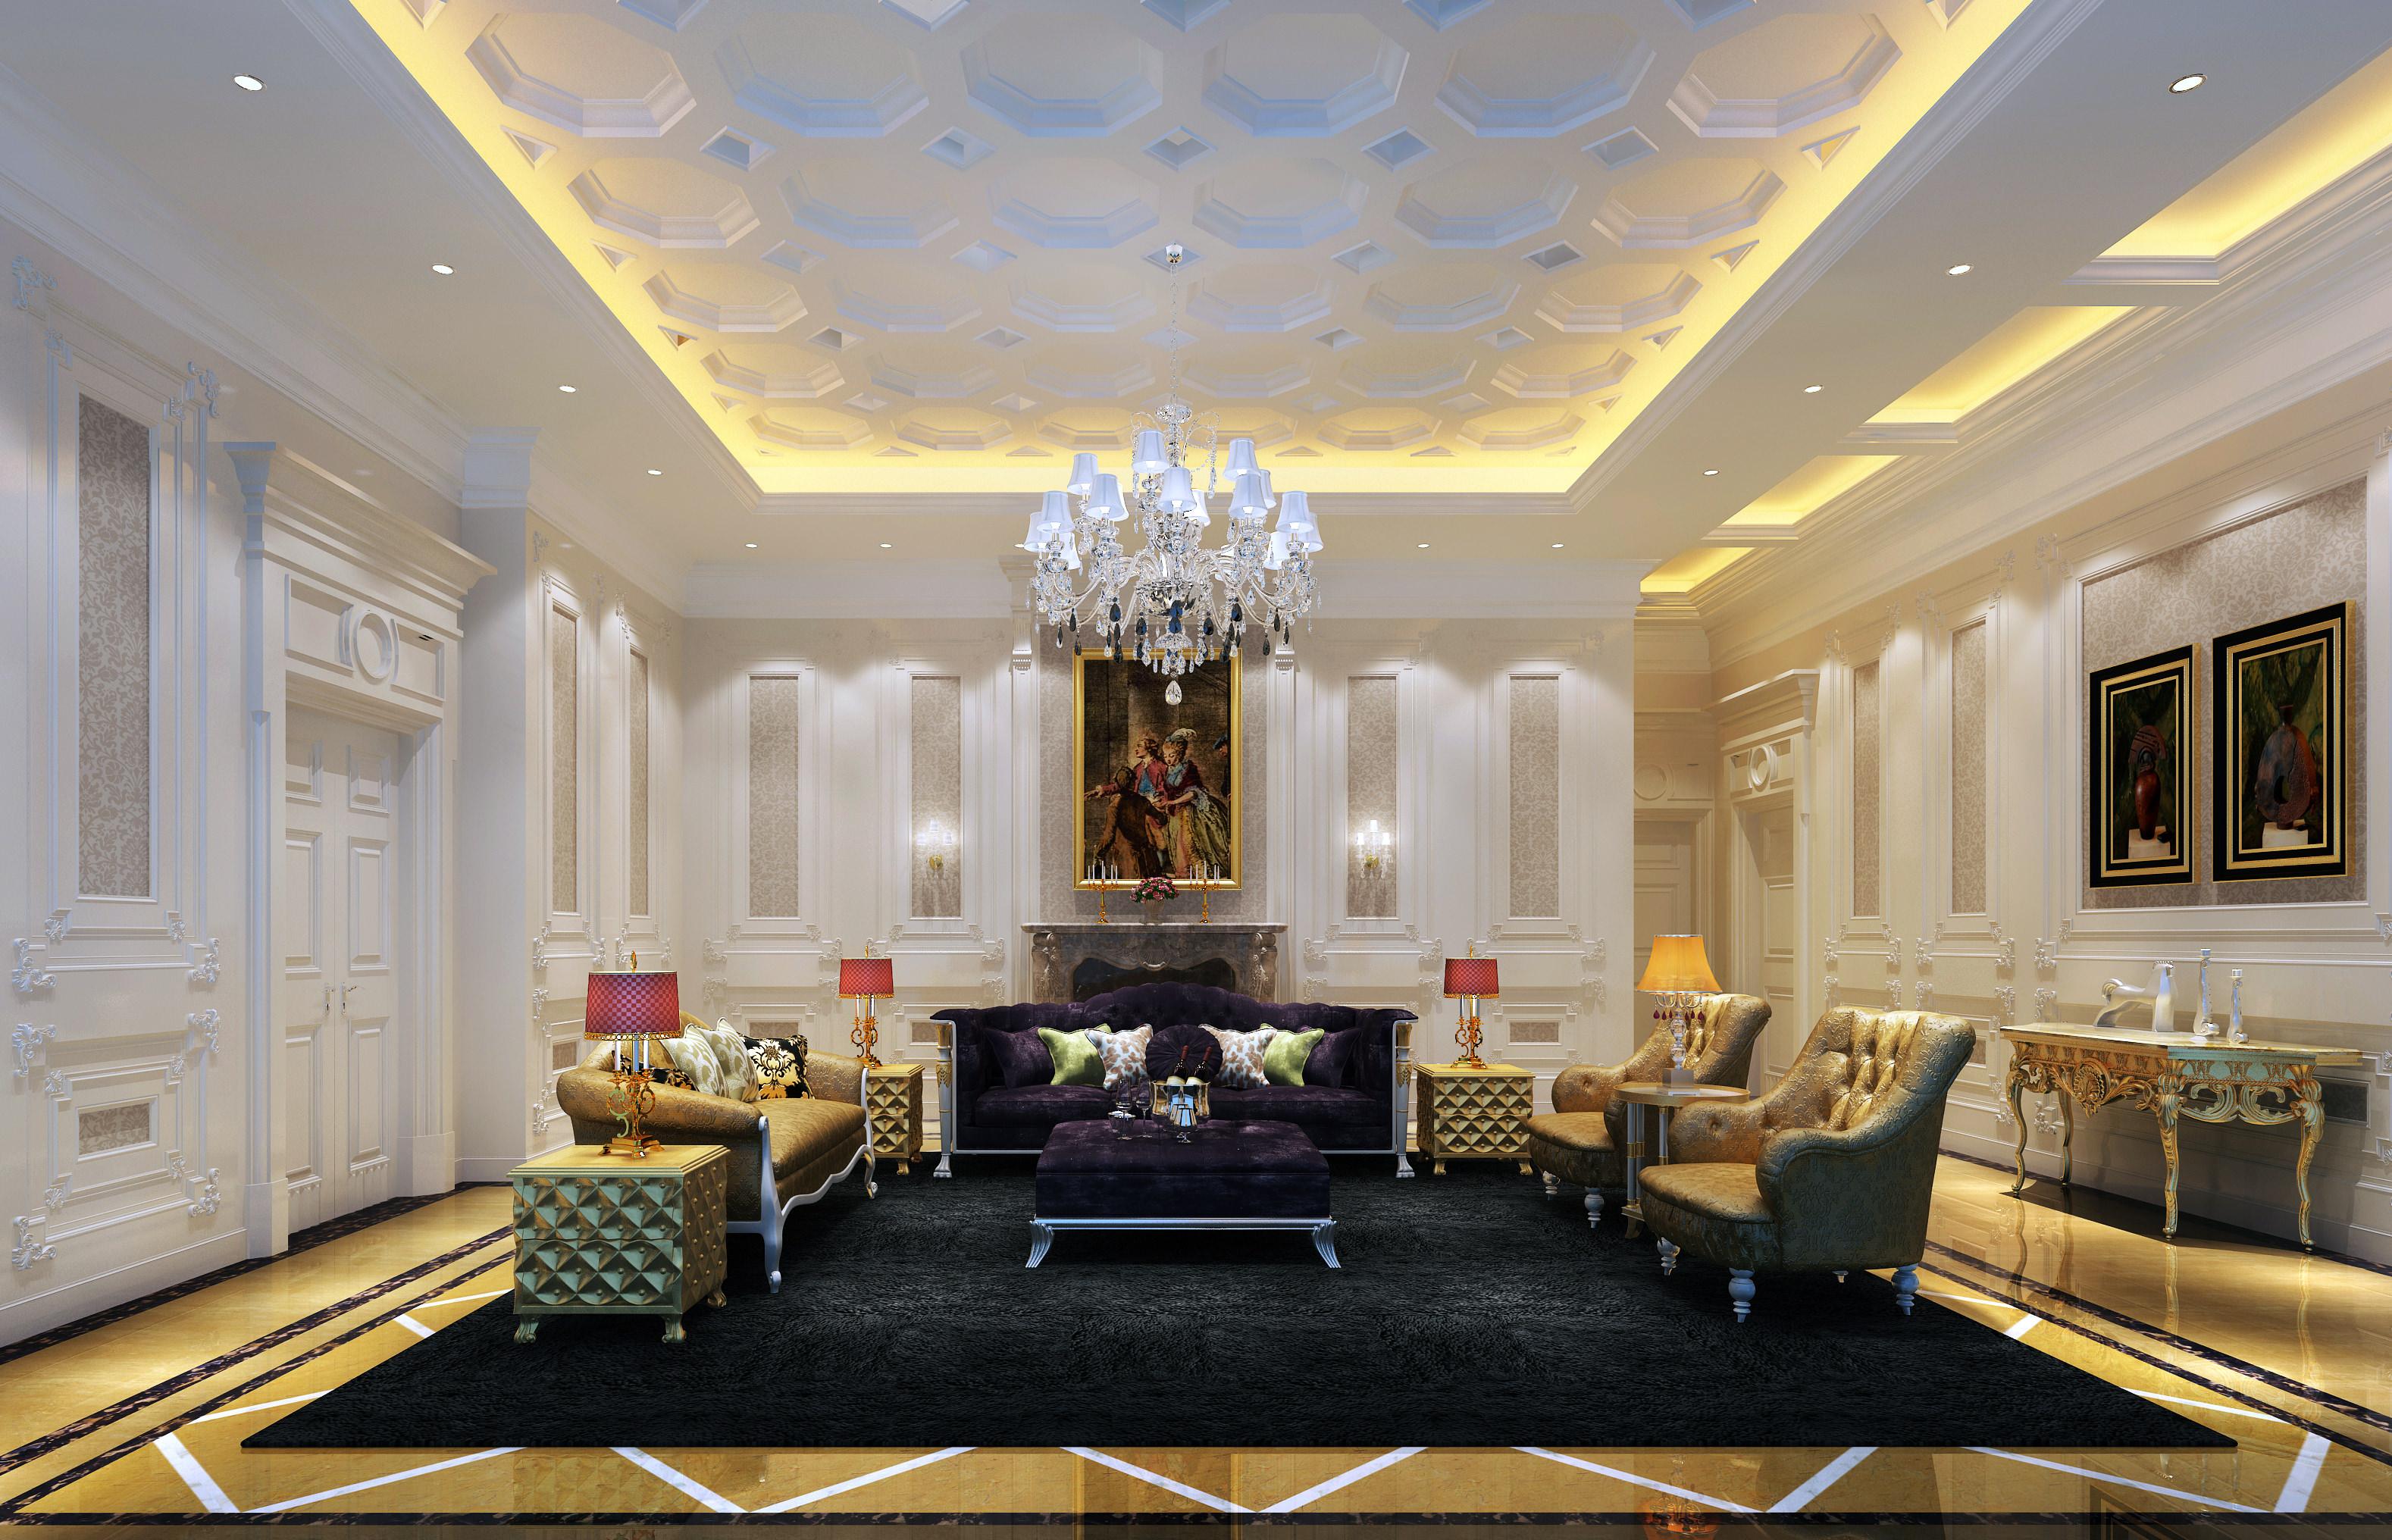 very luxury living room 3d model max 1 - Luxury Living Room Design